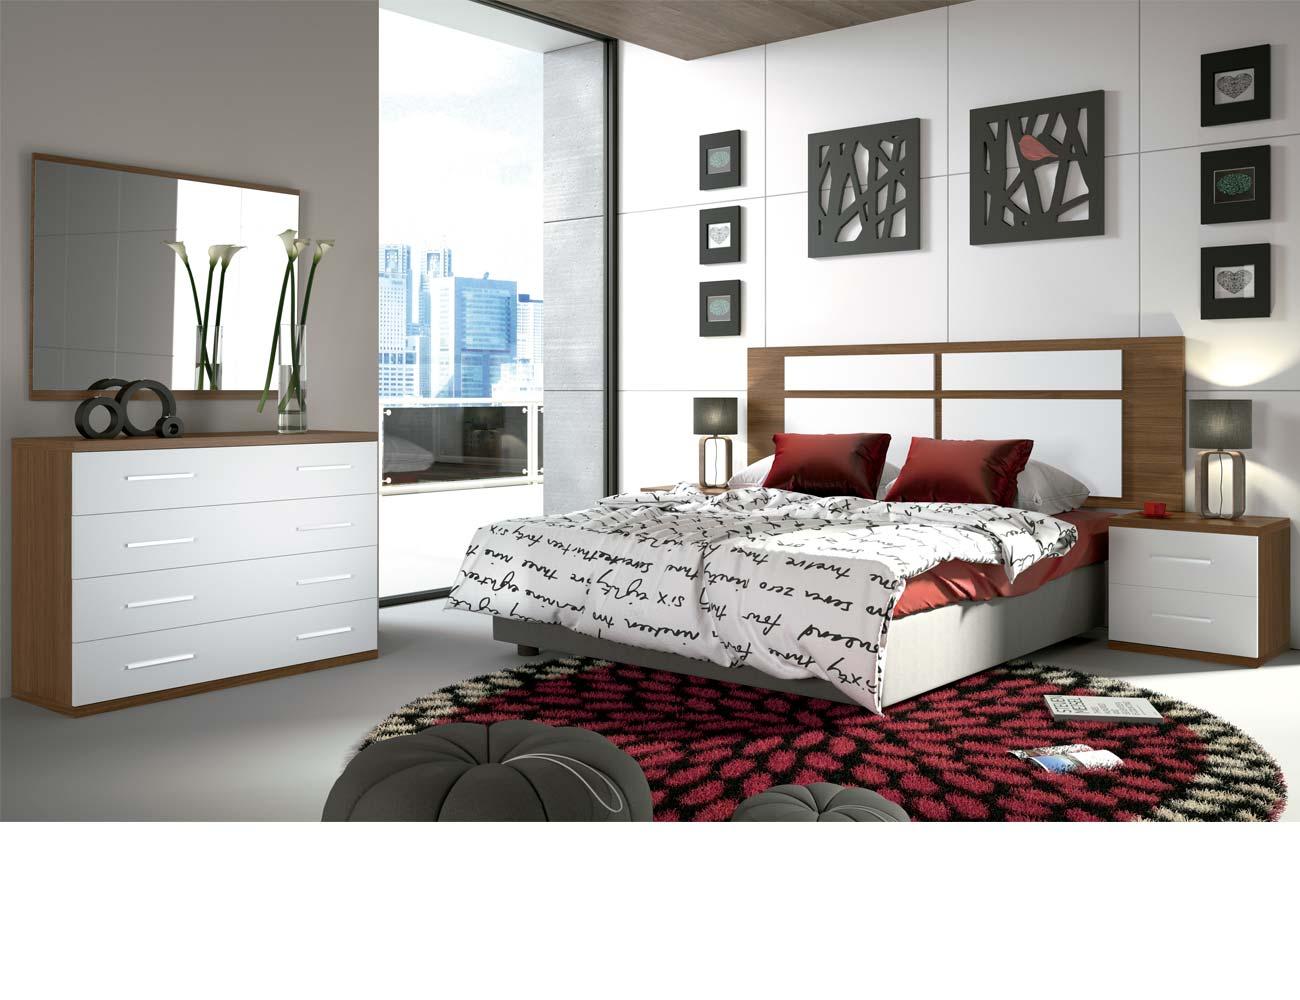 Dormitorio matrimonio moderno 30 nogal blanco